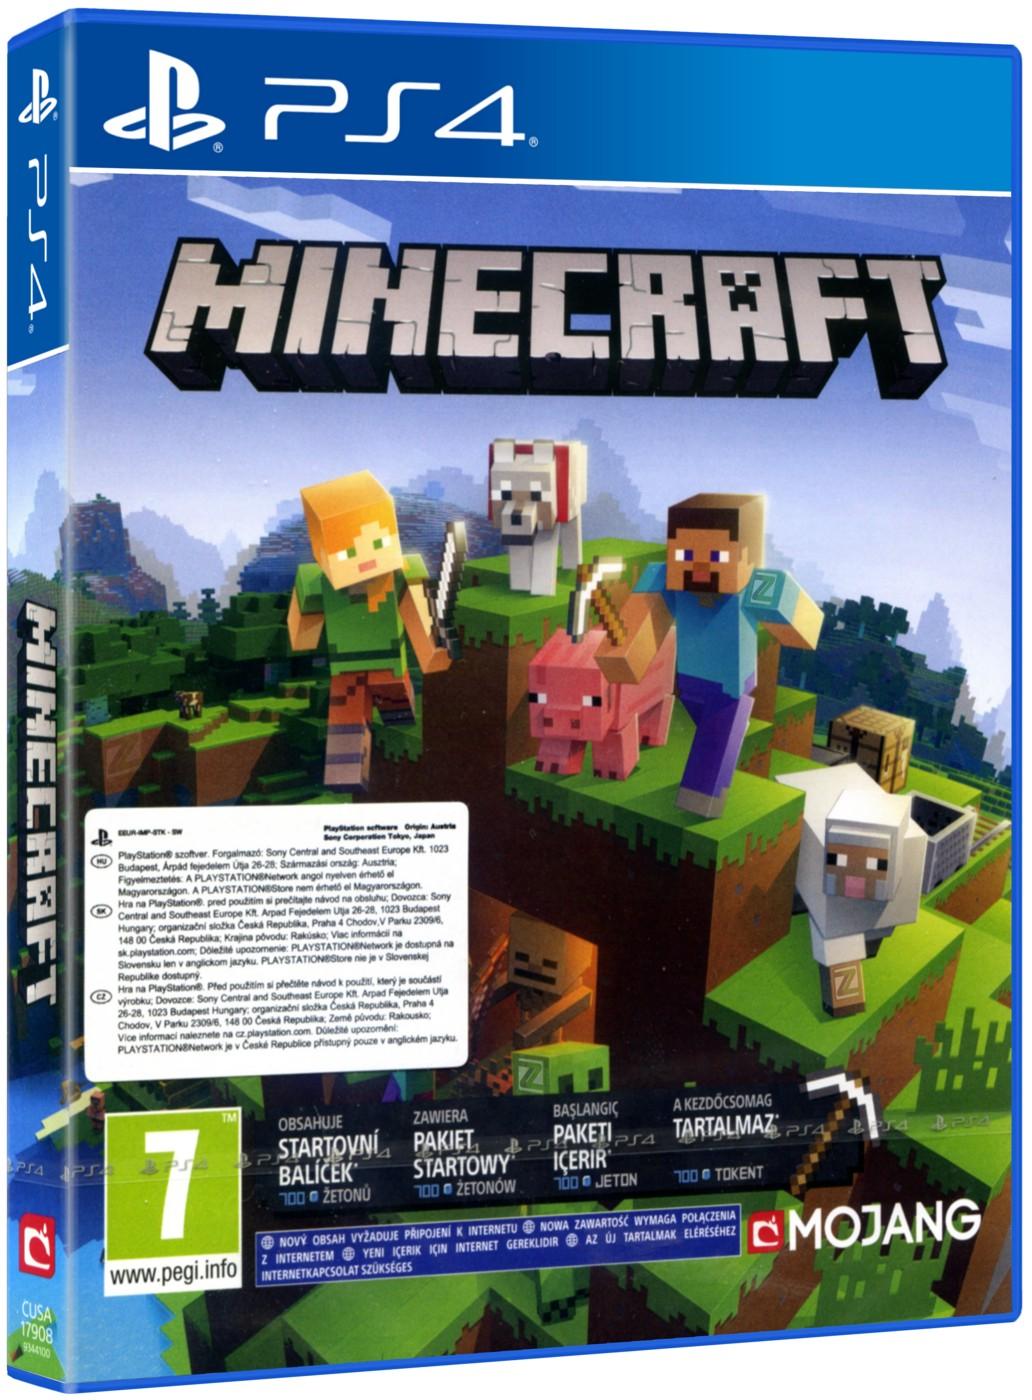 Minecraft (Bedrock Edition) - PS4